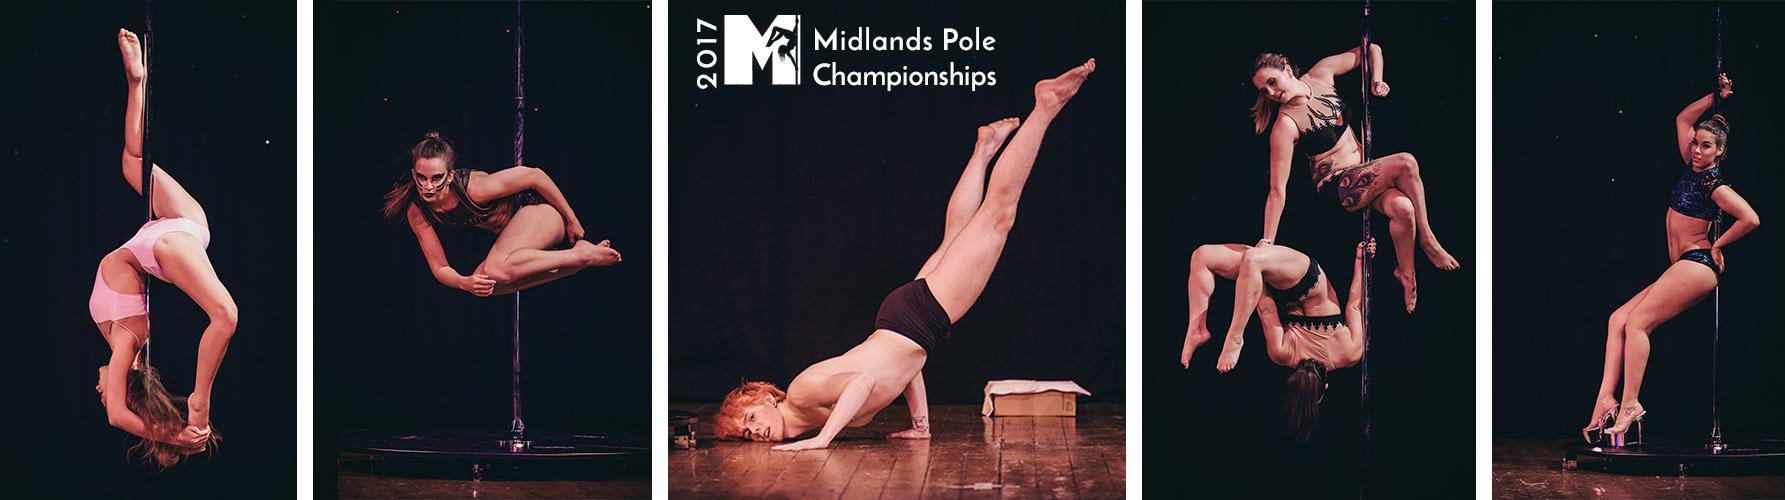 Midlands Pole Championships 2017